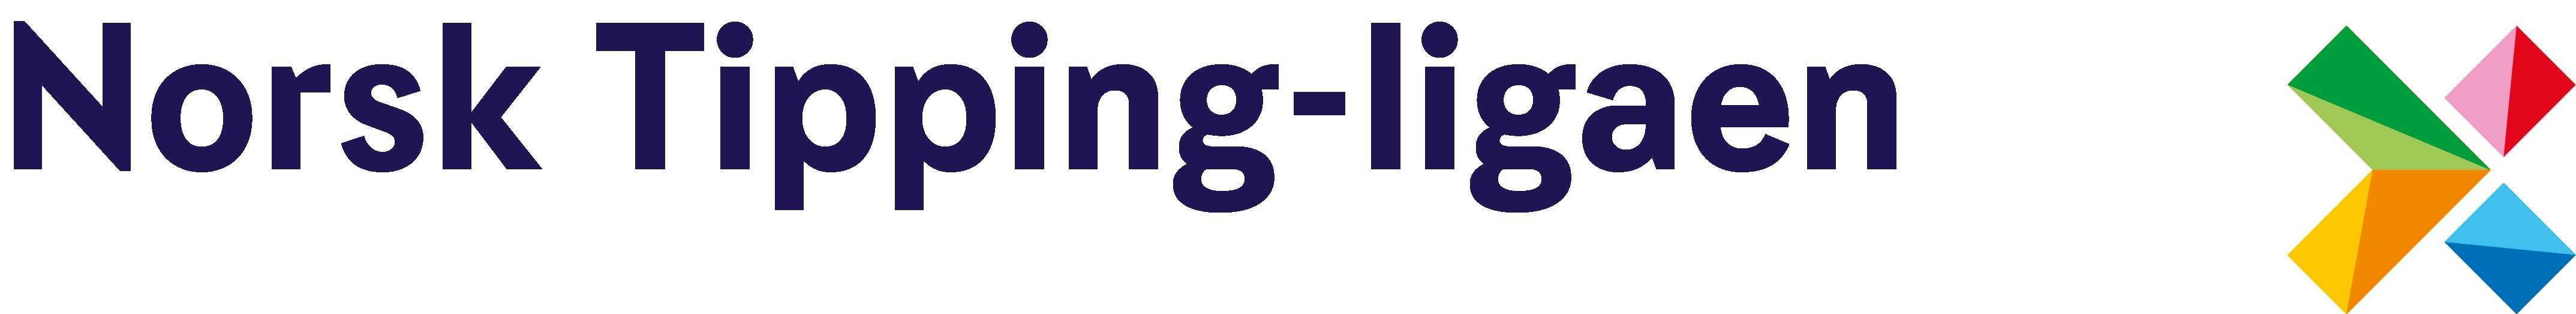 https://www.flintfotball.no/wp-content/uploads/2019/12/NT_Liga_logo_liggende_CMYK_pos.png